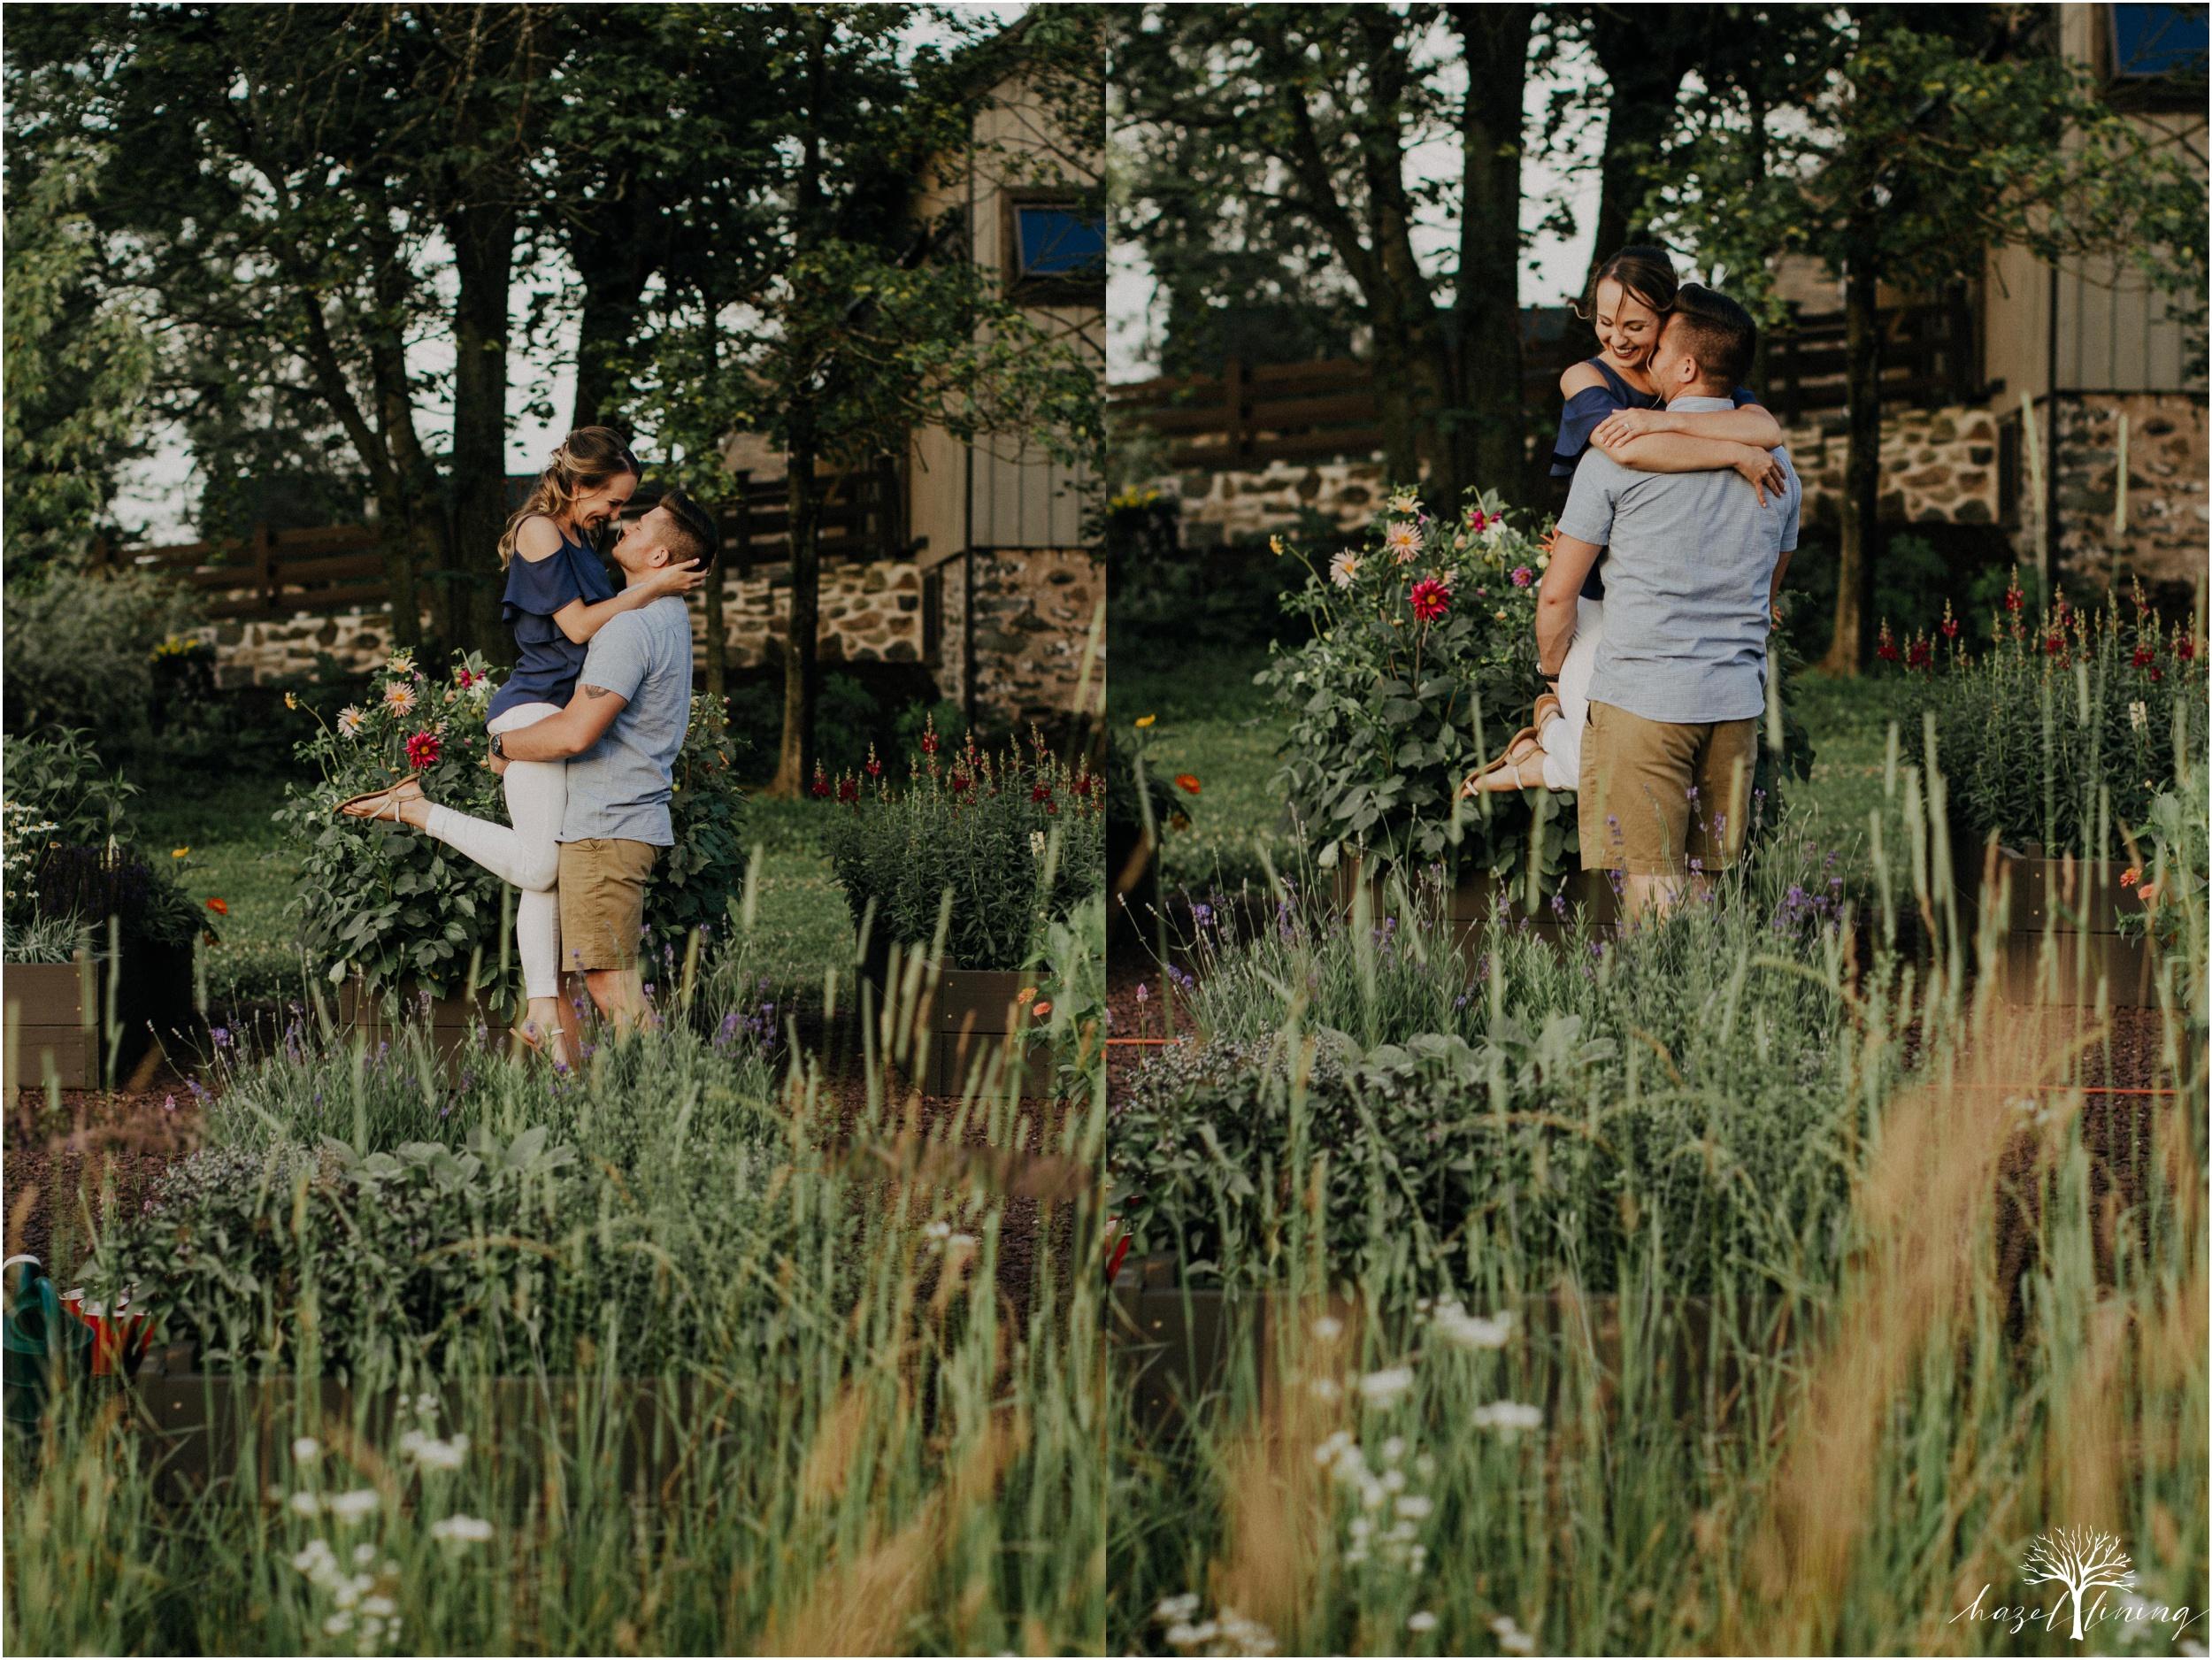 rachel-warner-chris-niedrist-the-farm-bakery-and-events-quakertown-pa-summer-engagement-hazel-lining-photography-destination-elopement-wedding-engagement-photography_0060.jpg